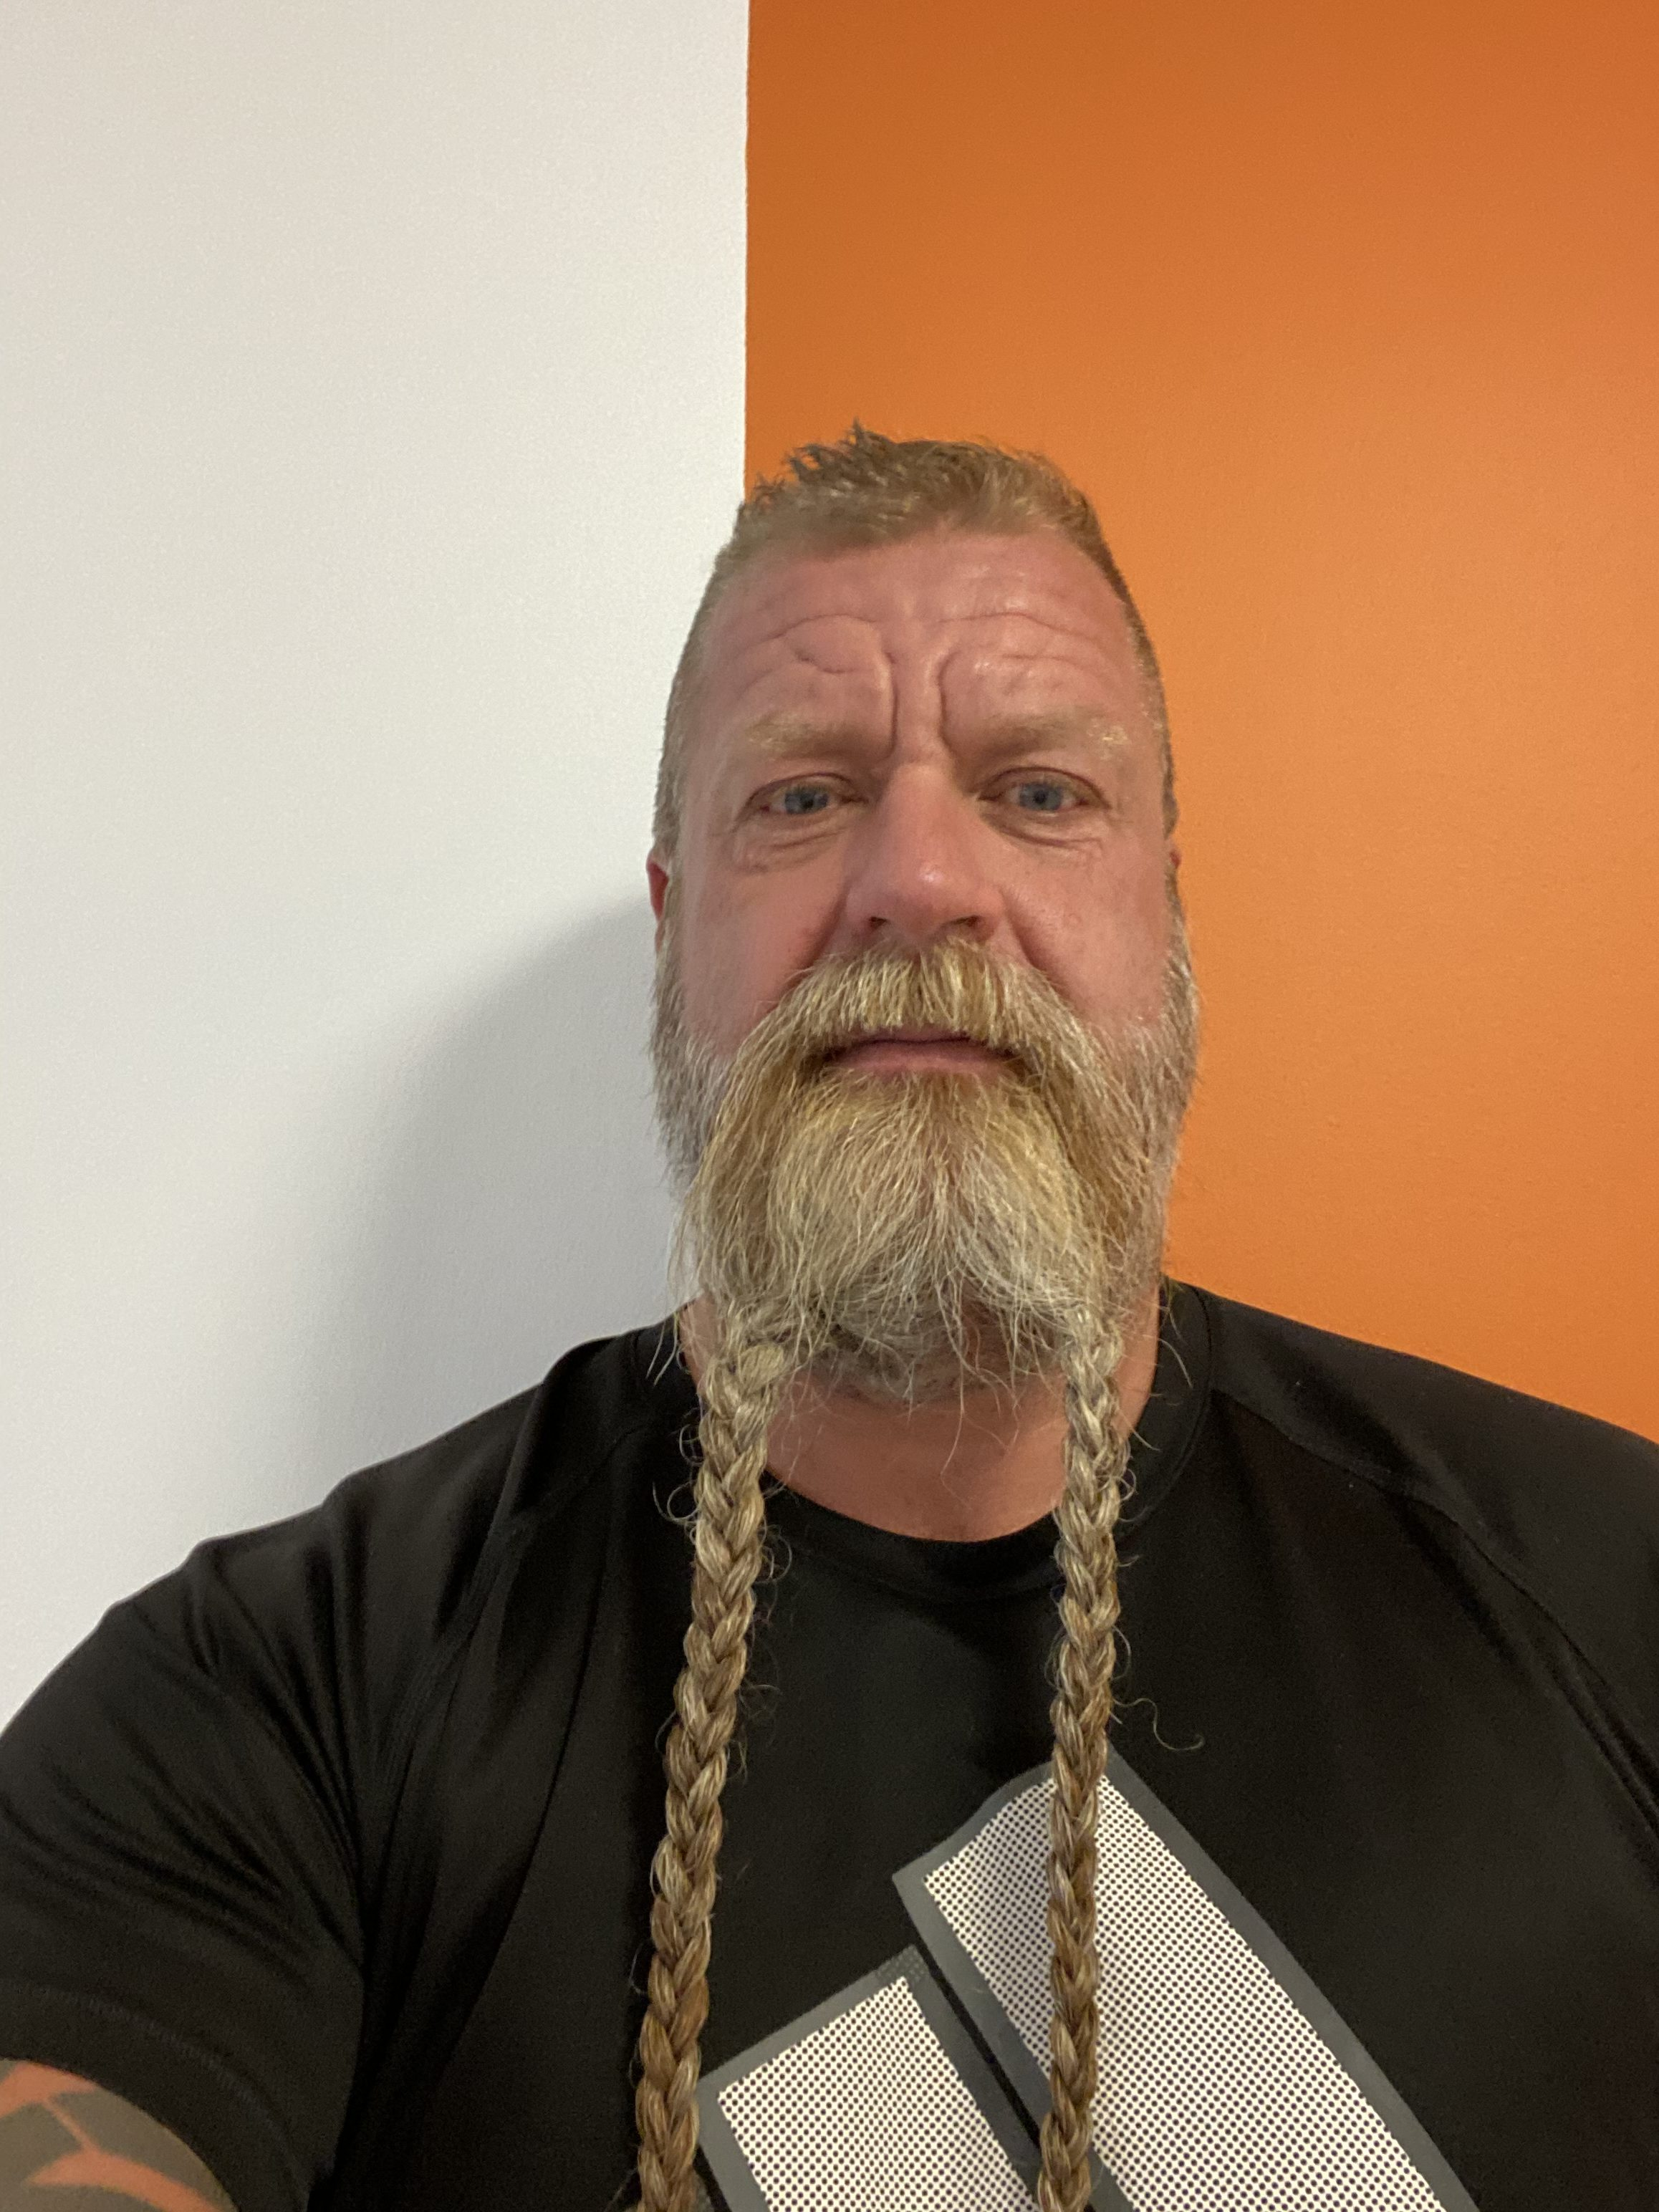 Björn Modigh